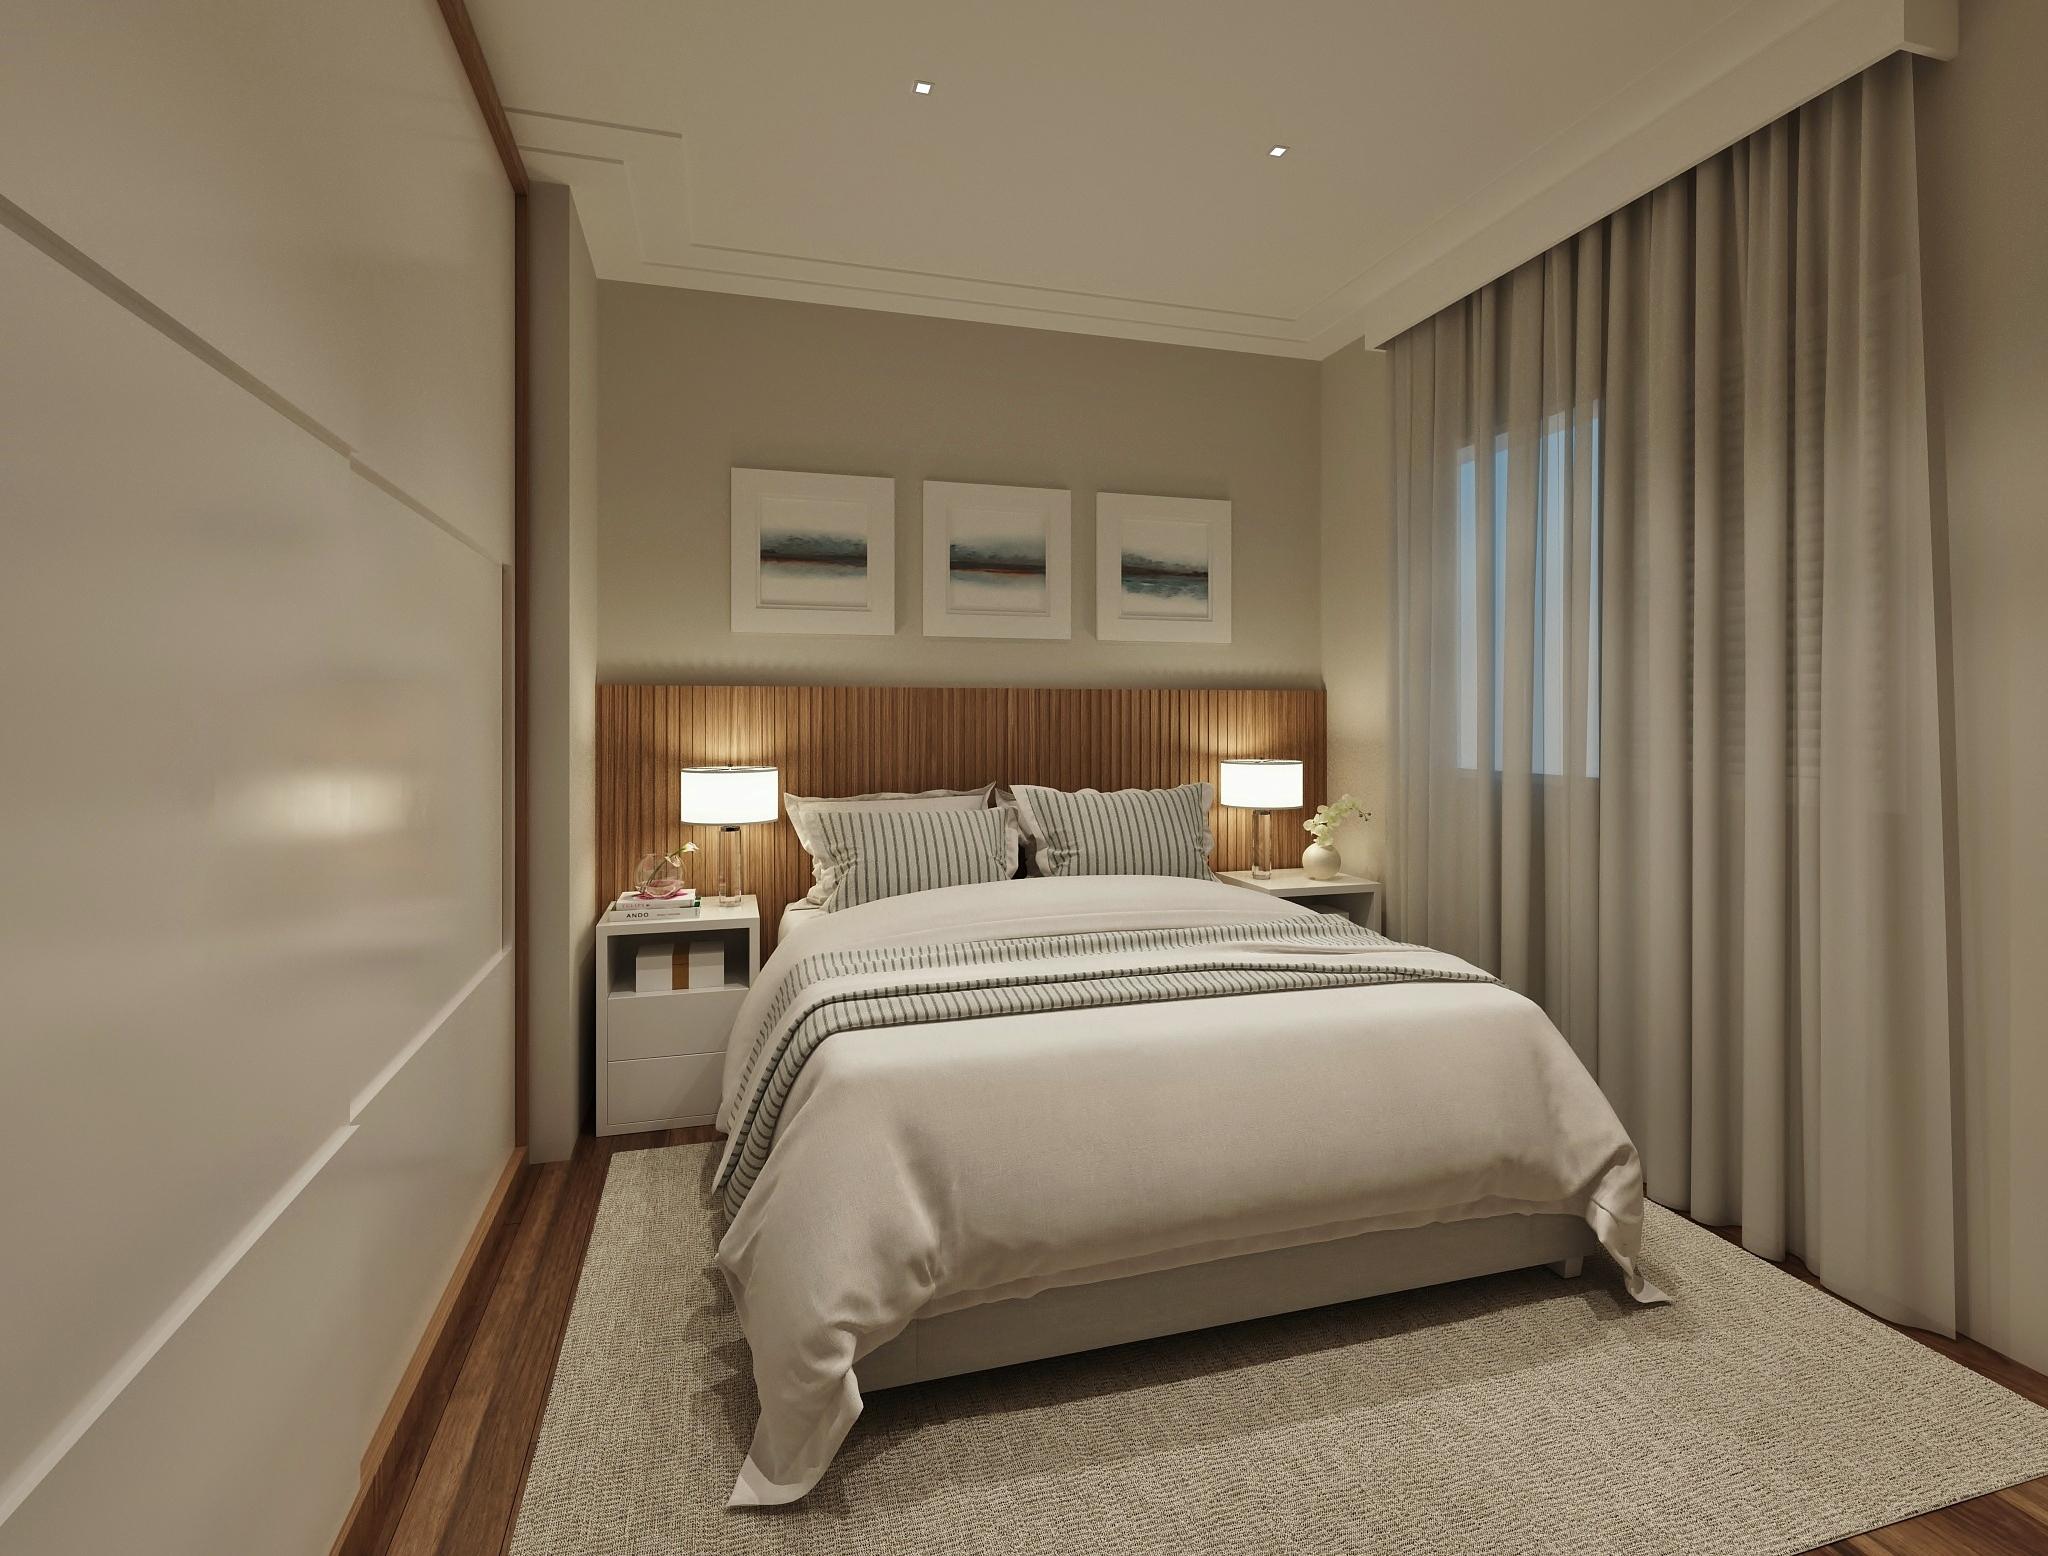 zorzi-engenharia-ideale-uno-suite.jpg